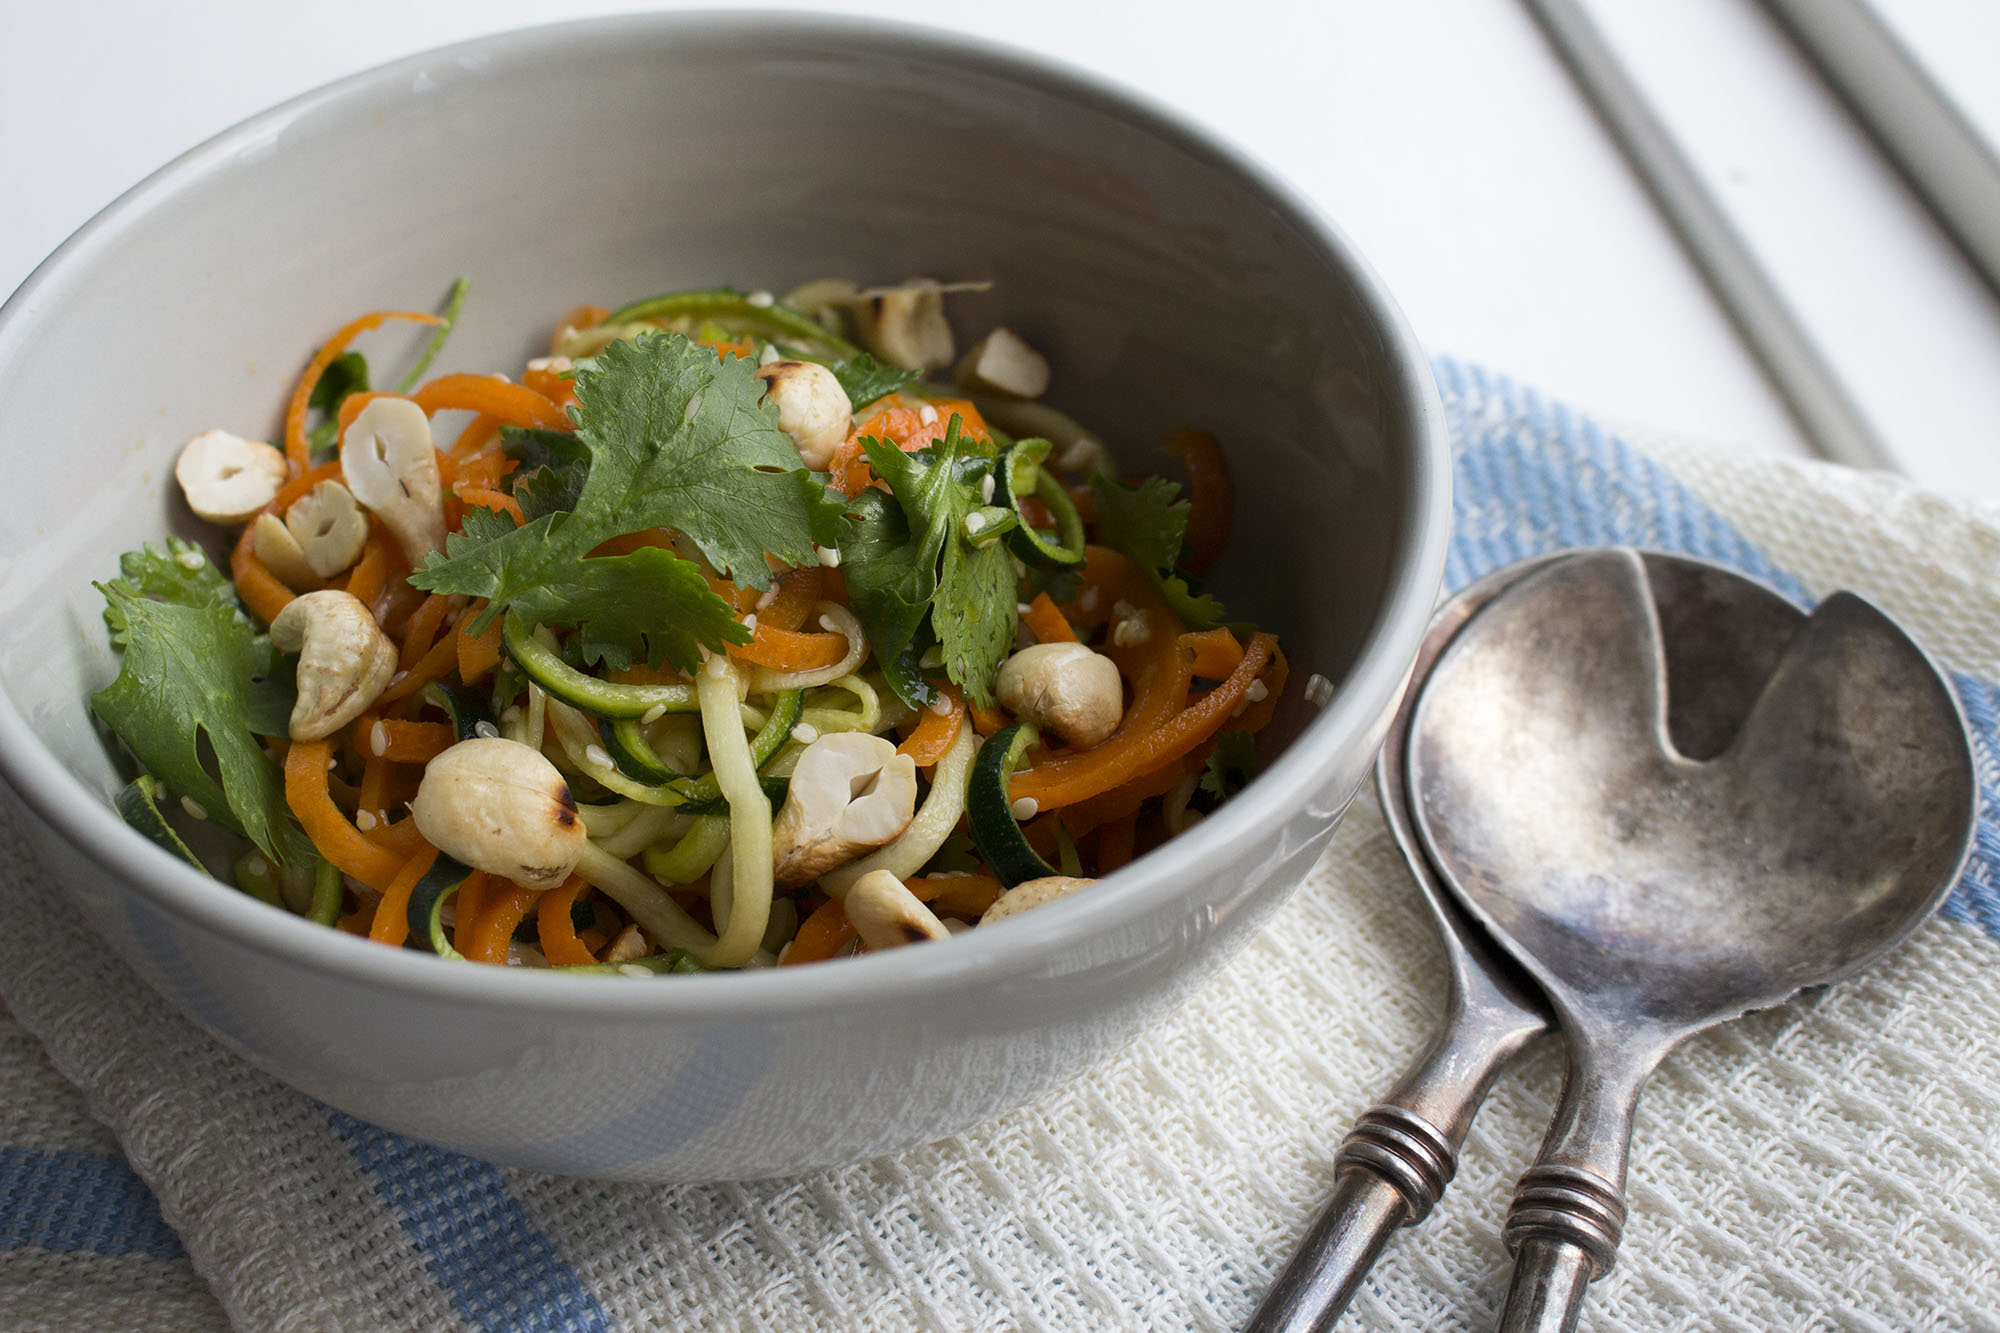 Asiatisk inspireret salat med gulerod og squashstrimler